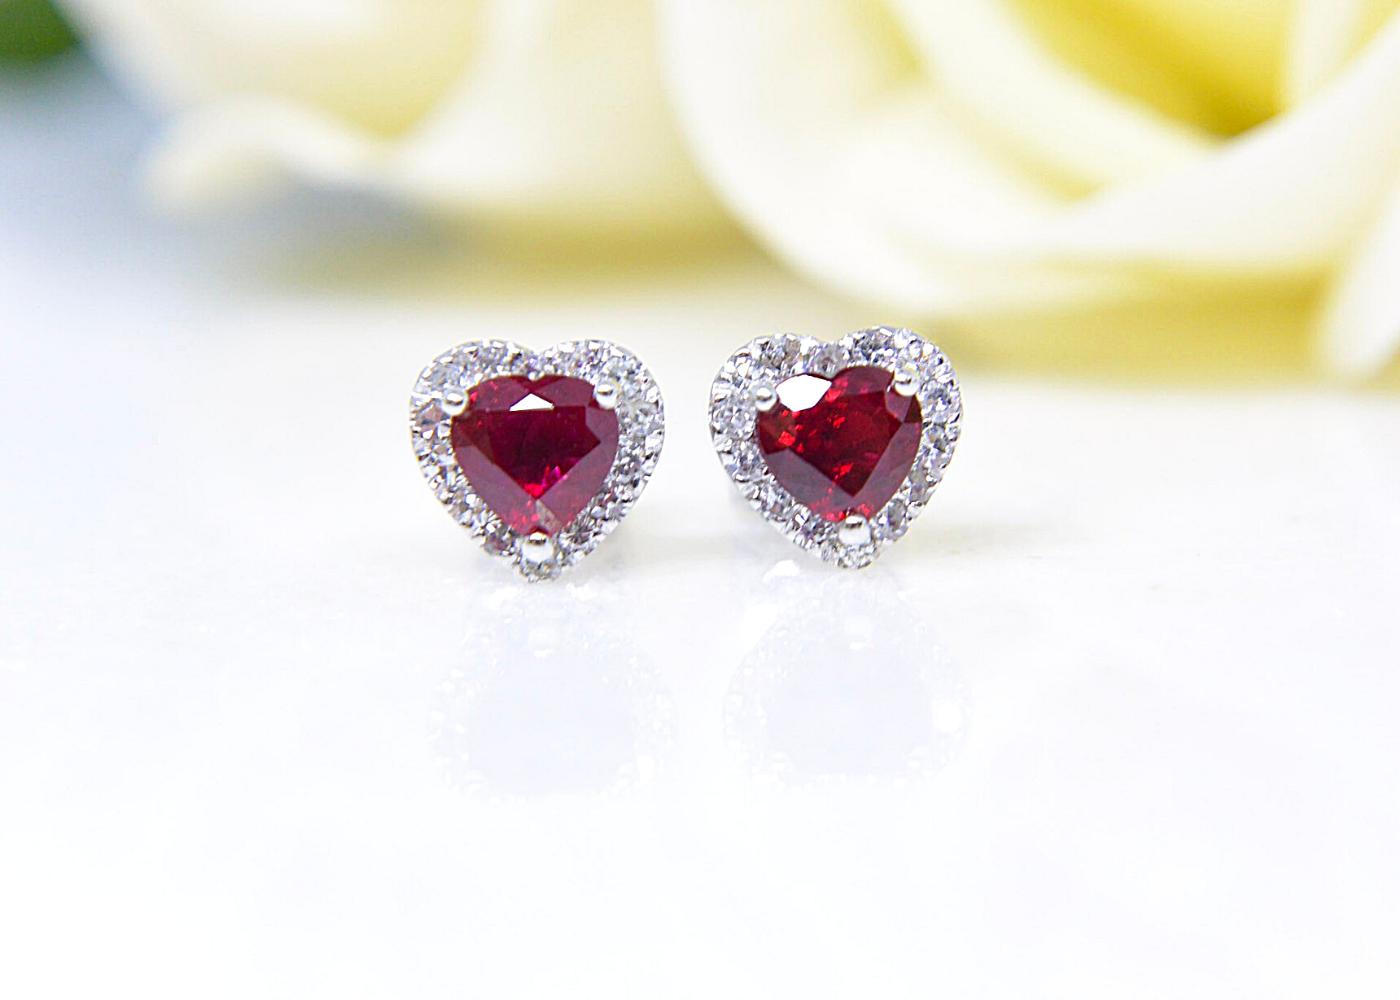 Rachel P Jewels: bespoke jewellery